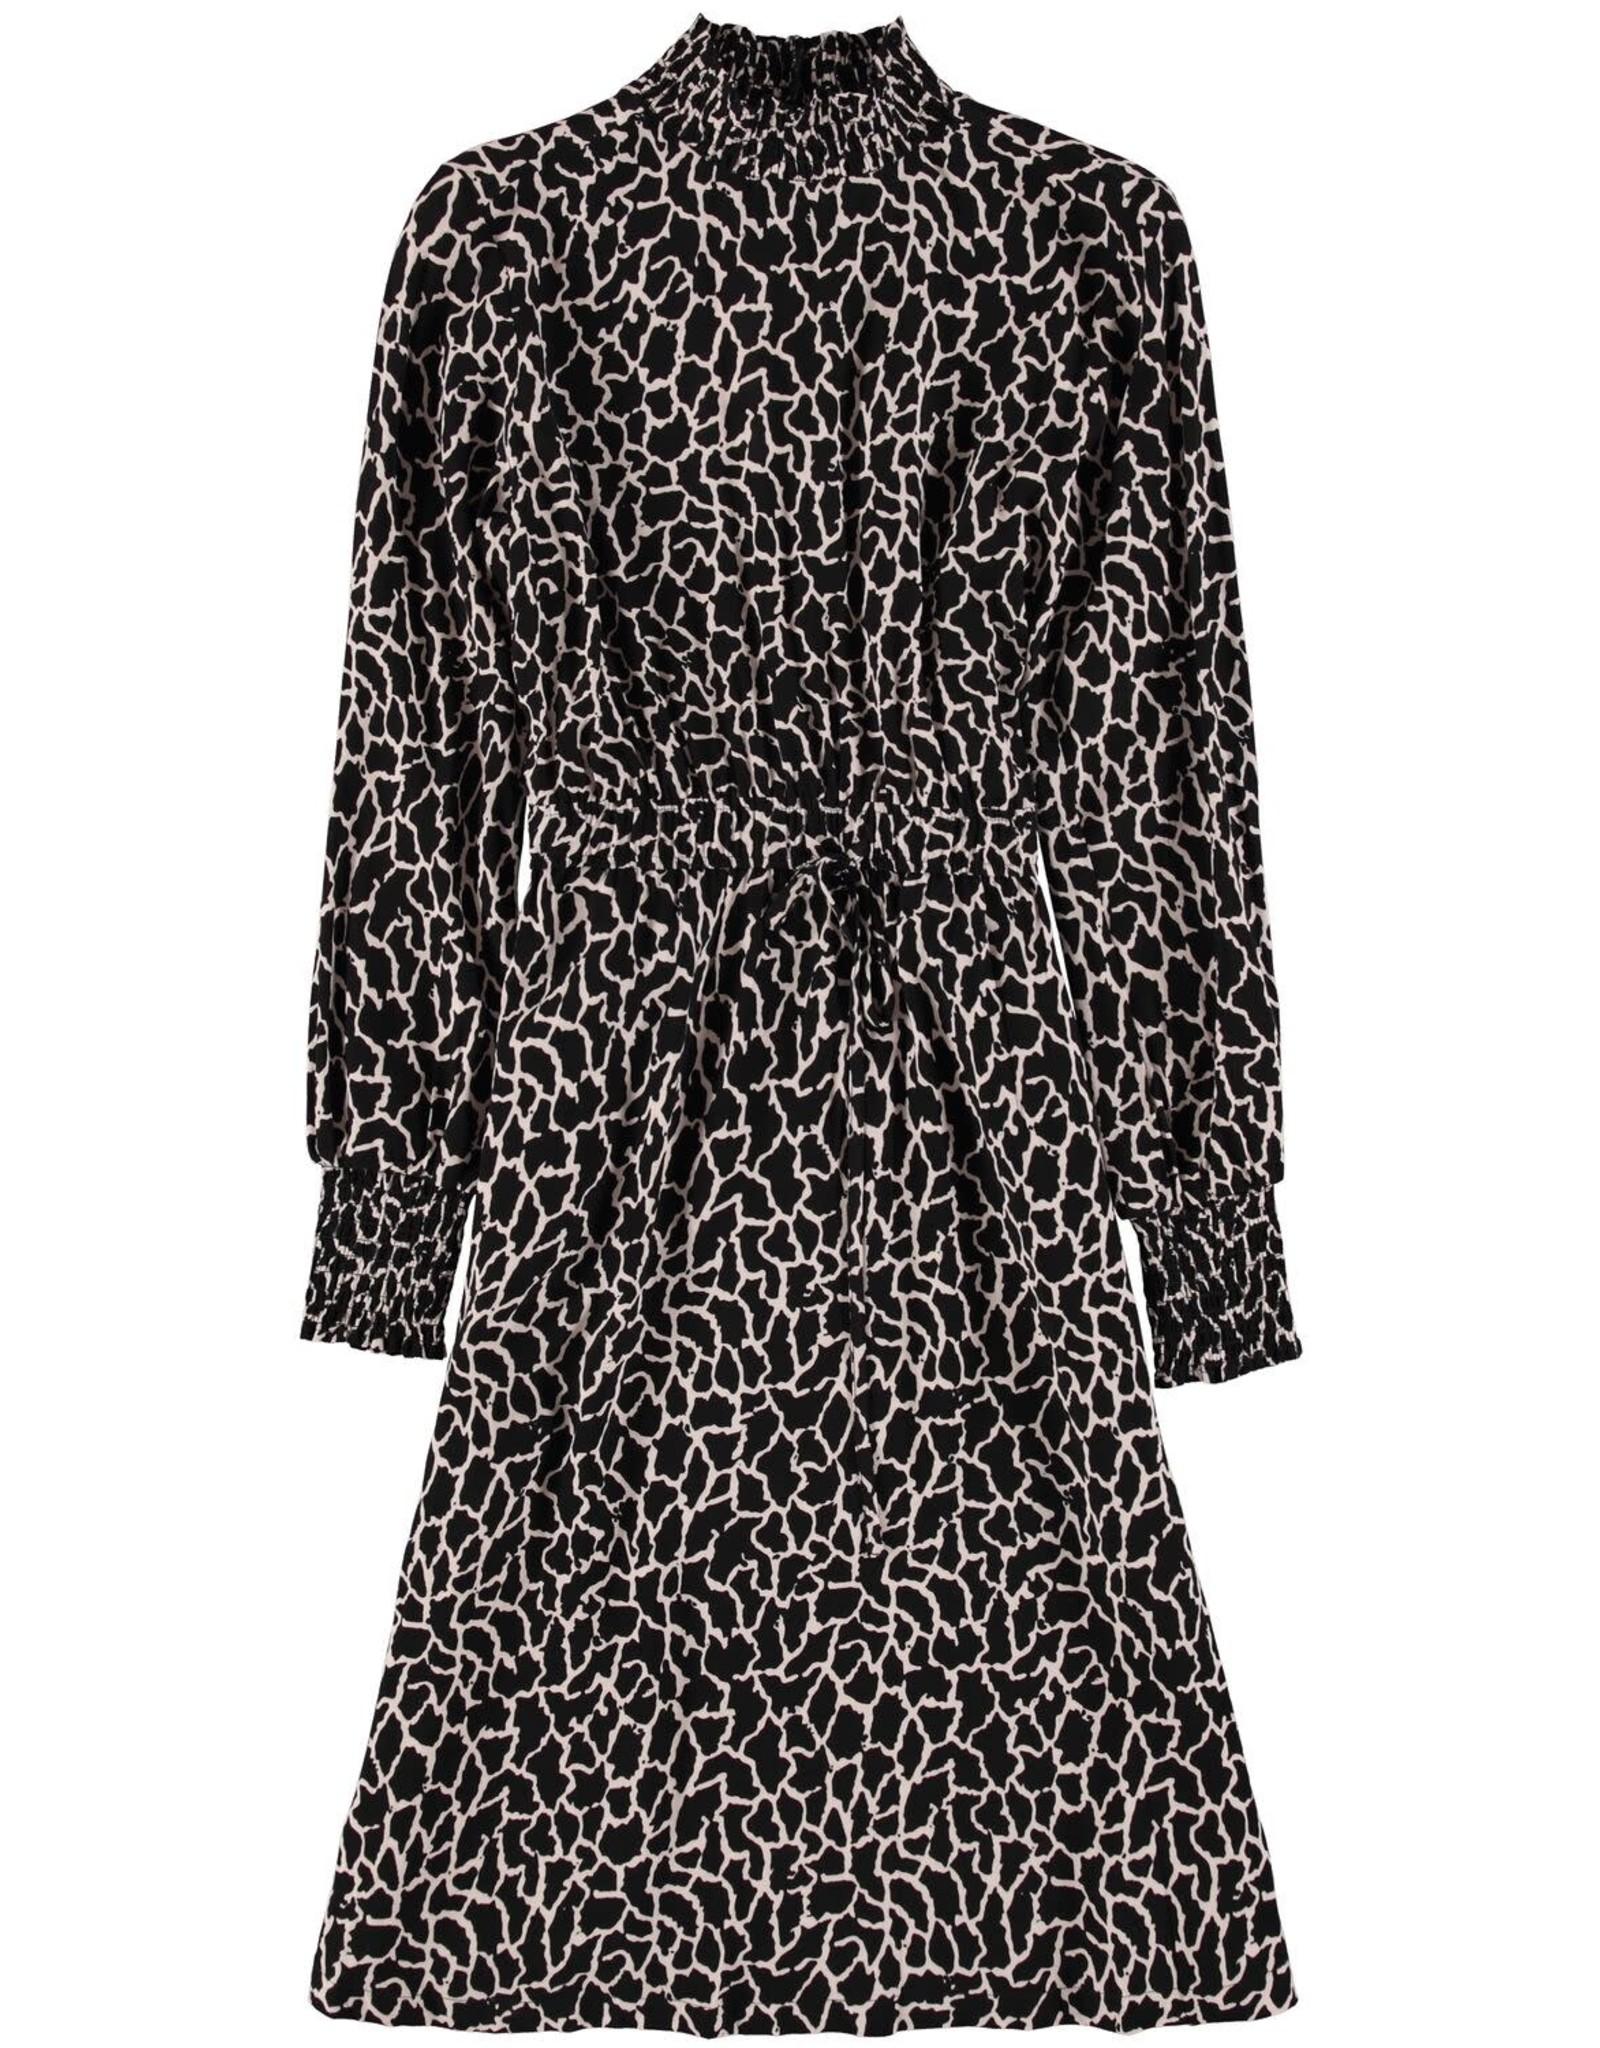 Garcia Garcia - Giraffe print dress